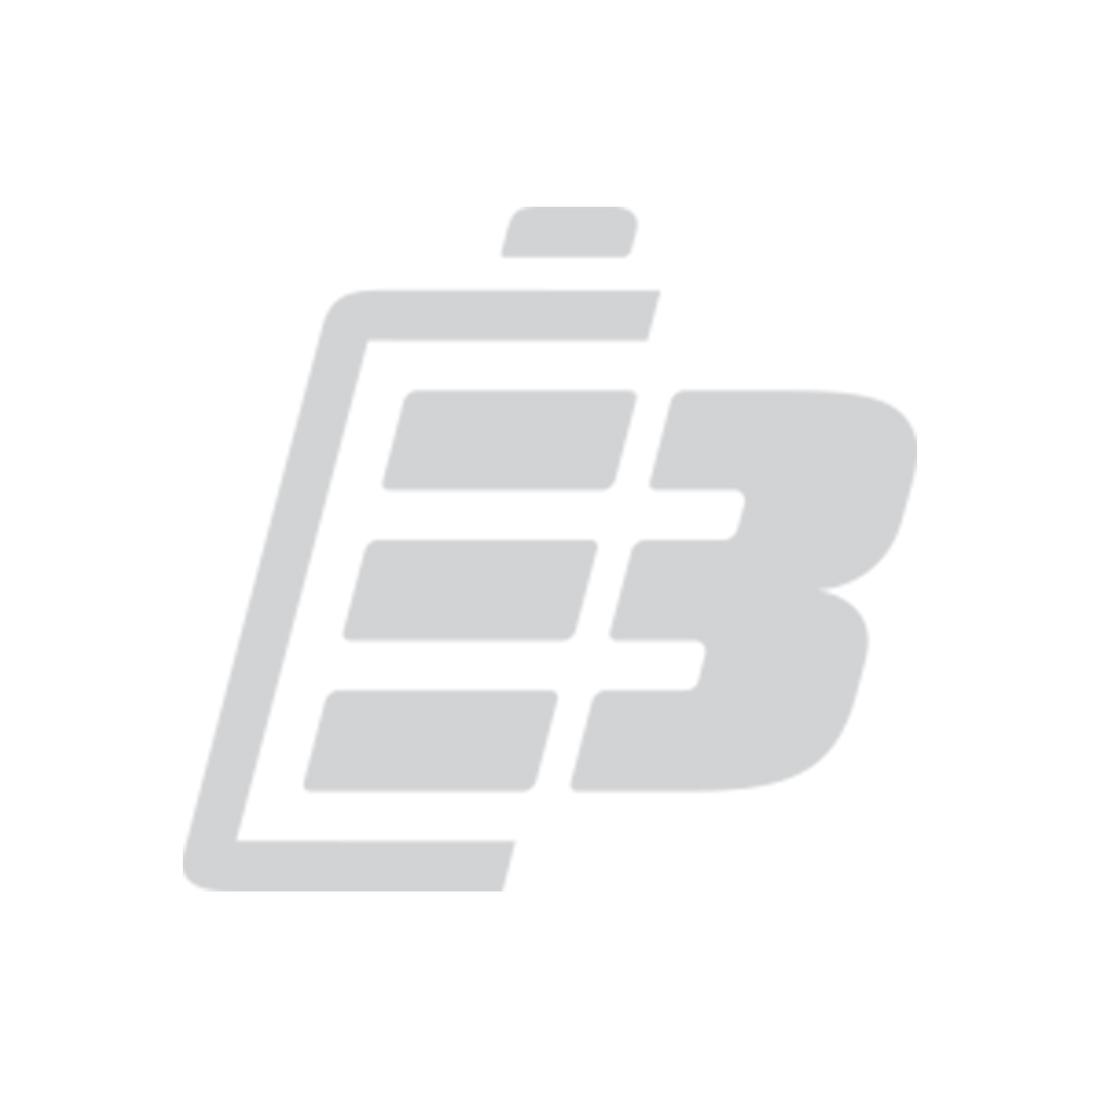 Laptop battery Asus ZenBook UX31_1